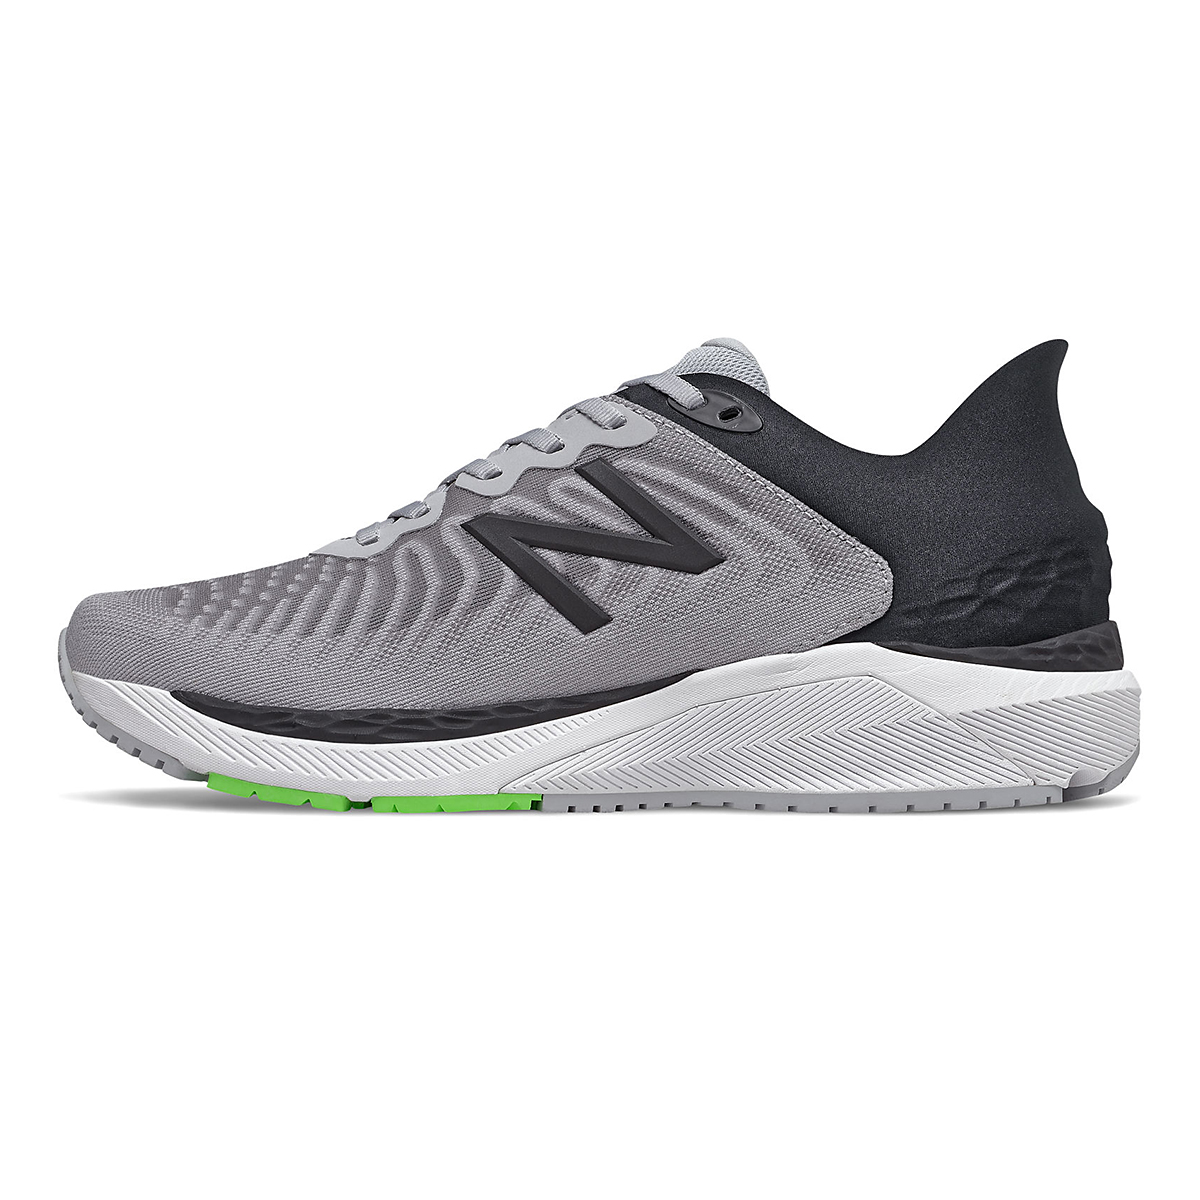 Men's New Balance 860V11 Running Shoe - Color: Light Aluminum/Black - Size: 6 - Width: Wide, Light Aluminum/Black, large, image 2